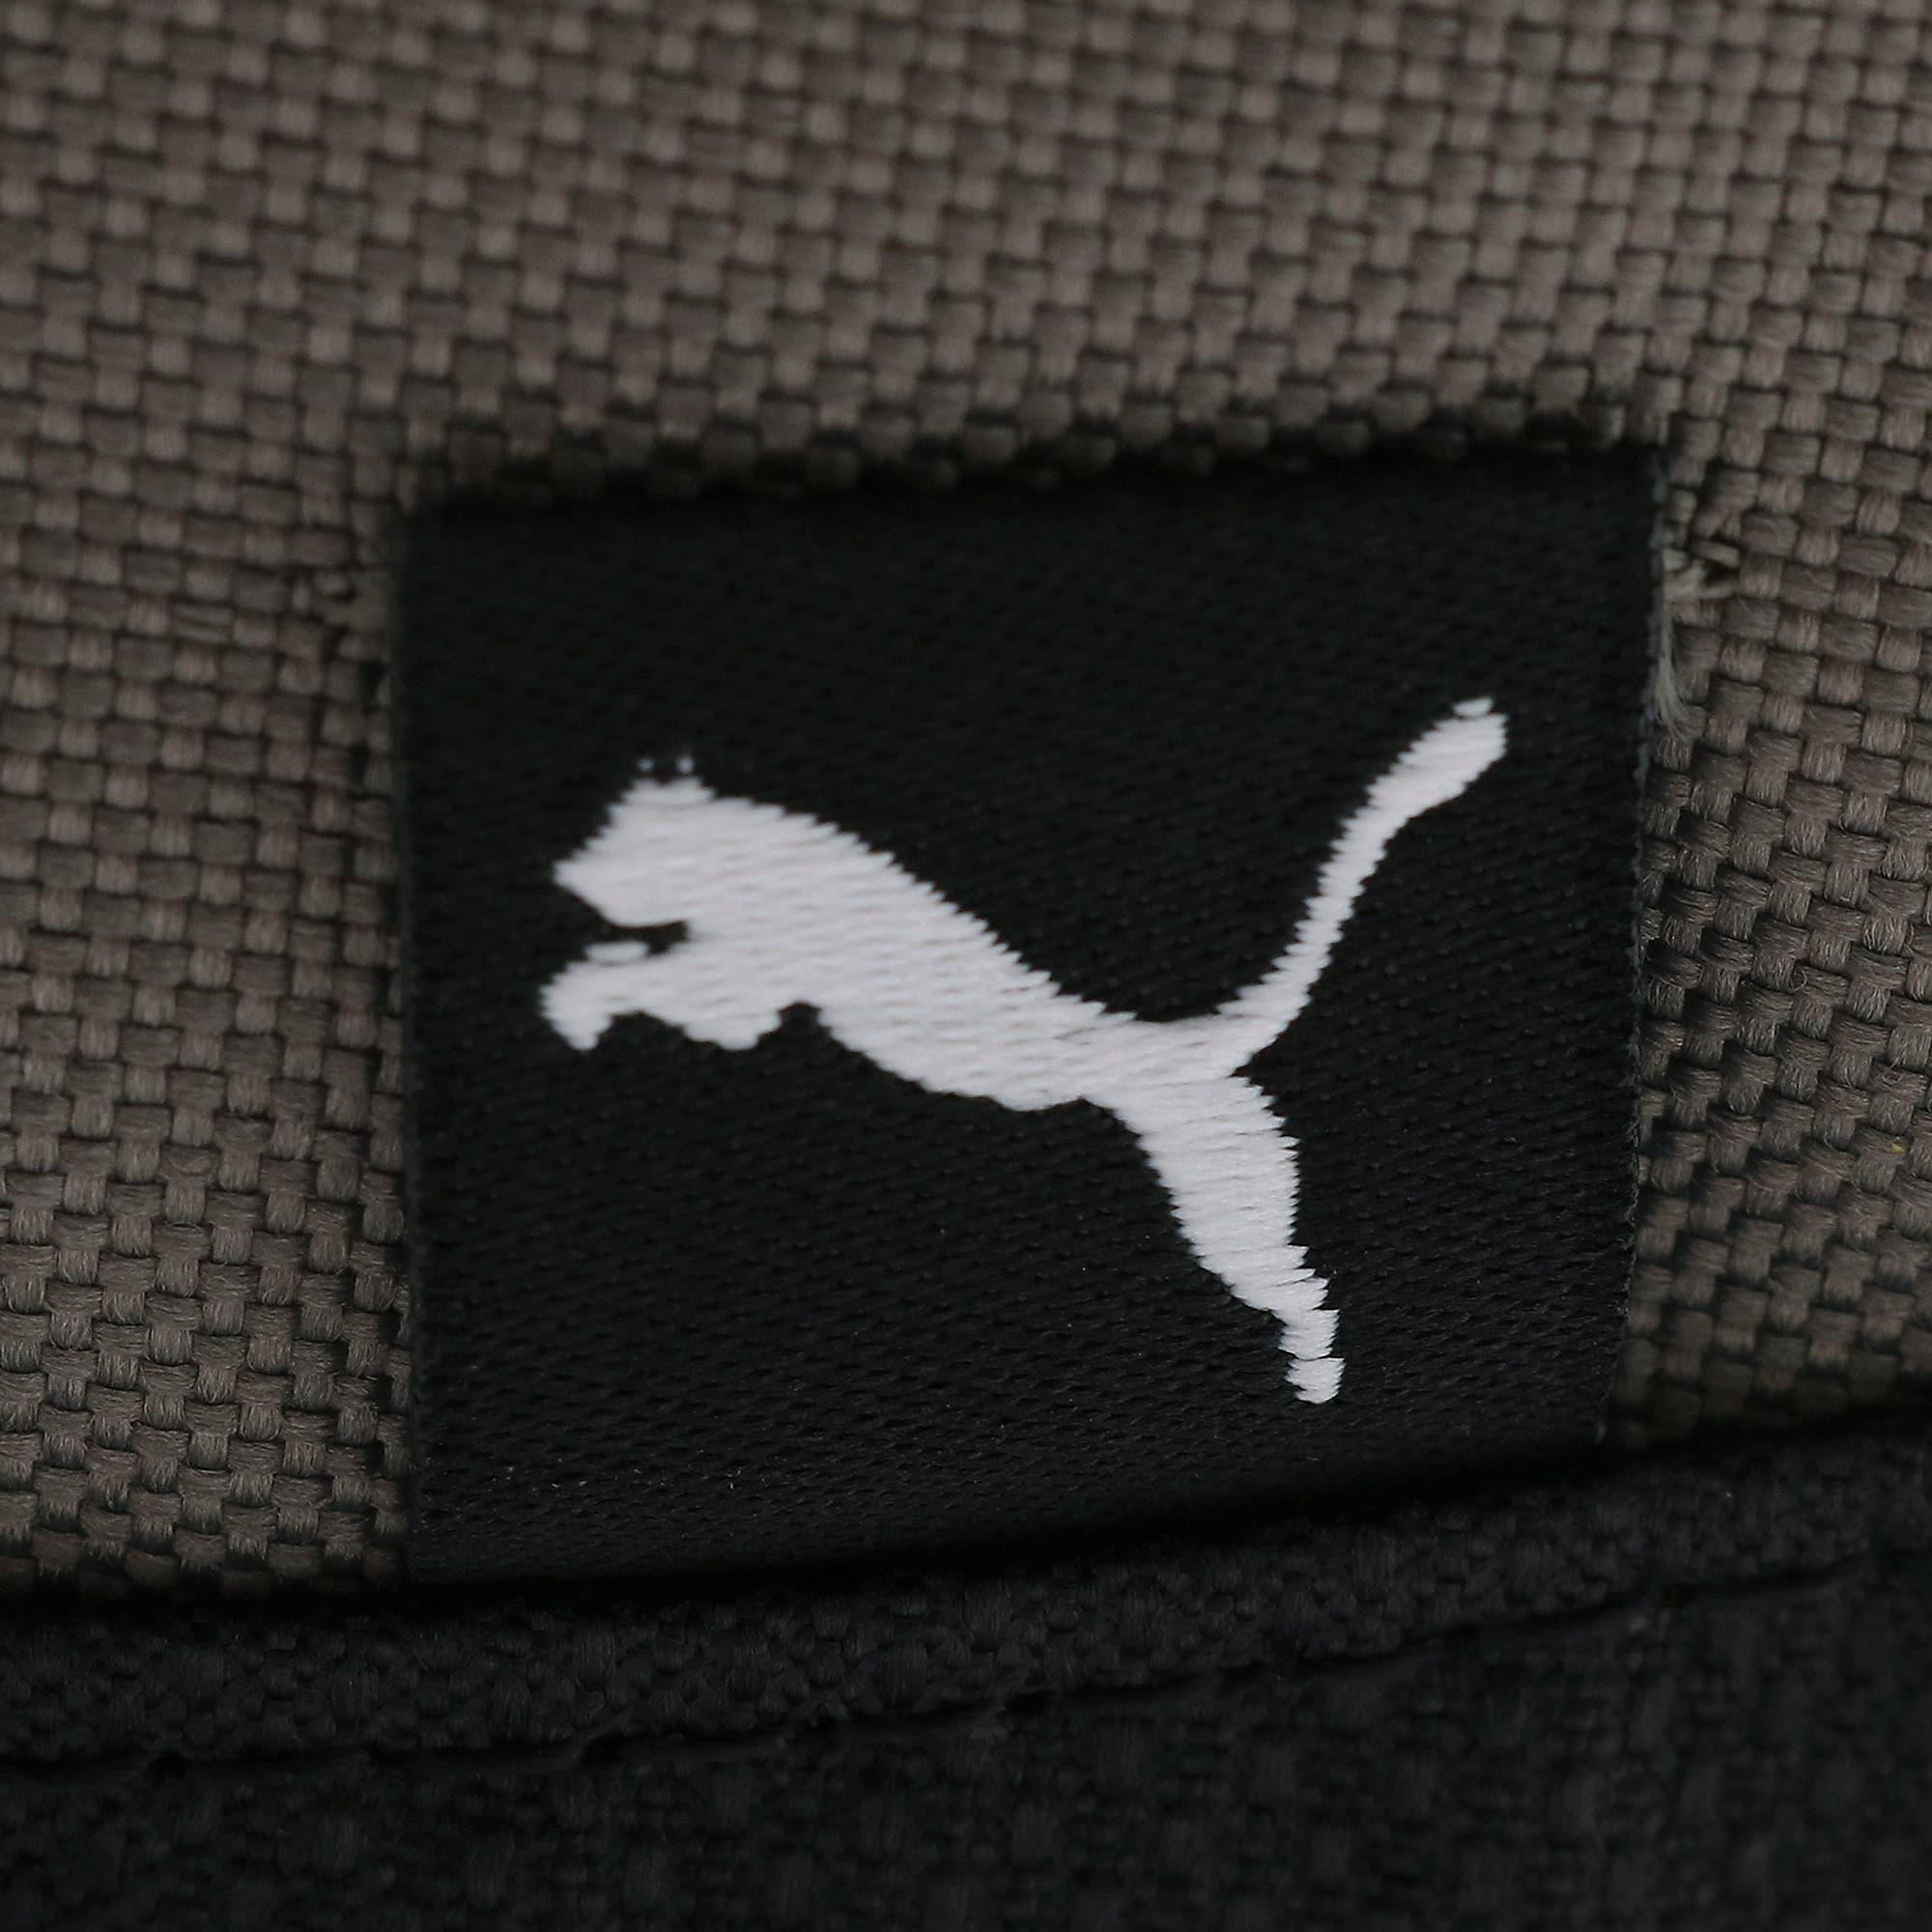 Thumbnail 7 of プーマ ソール スマートバッグ 18L, Charcoal Gray-Puma White, medium-JPN